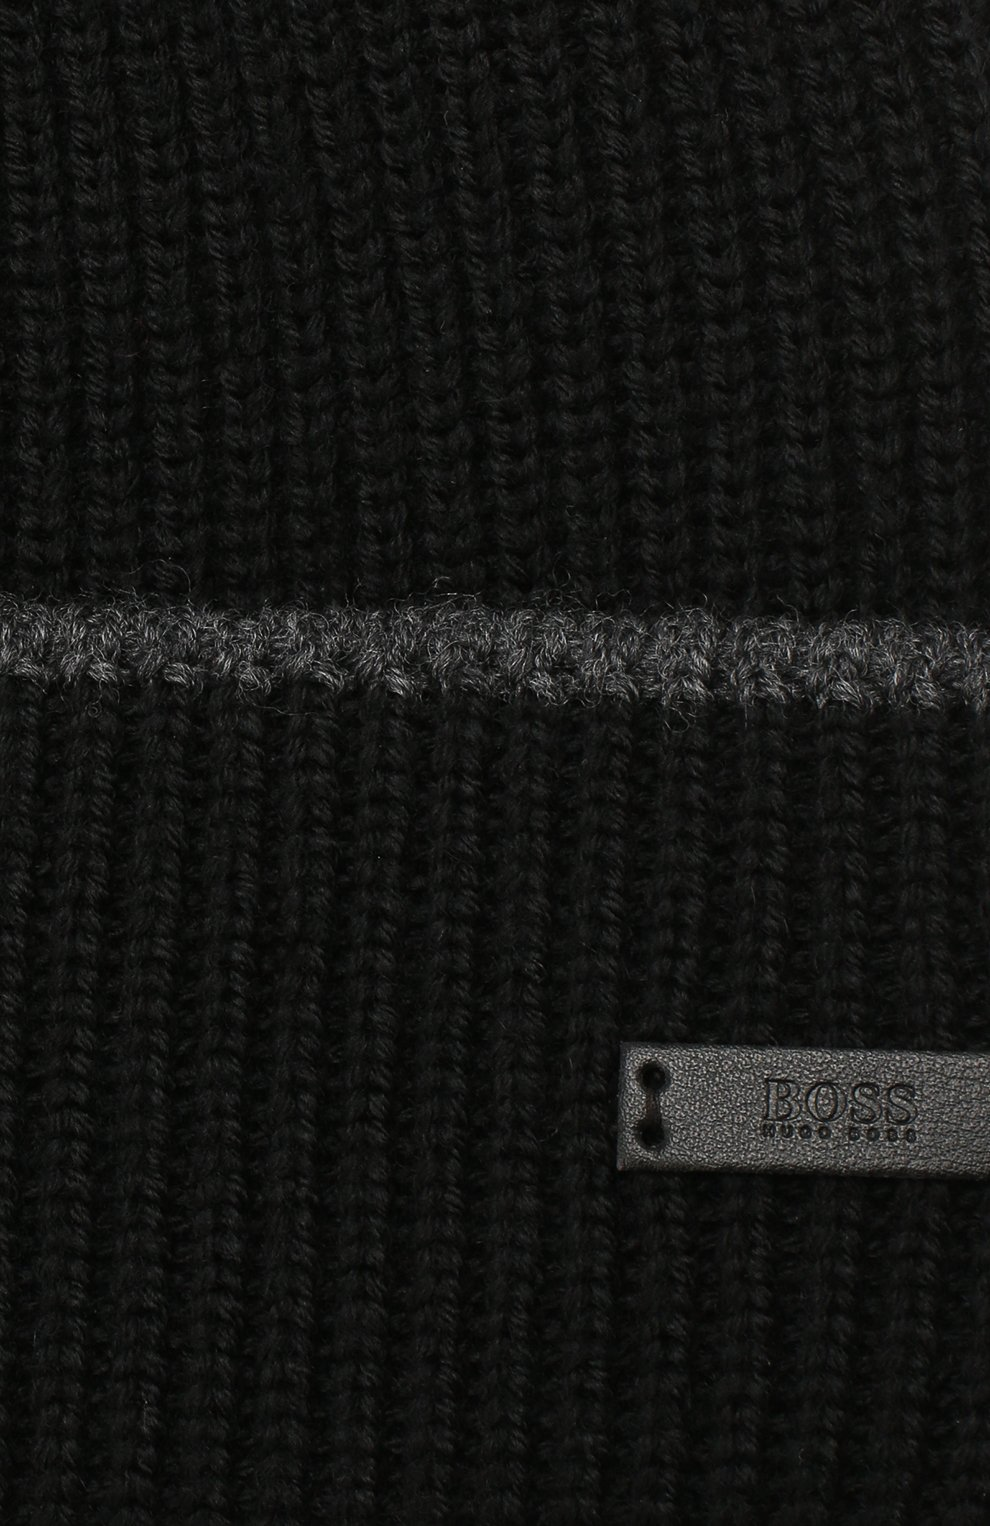 Мужская шерстяная шапка BOSS черного цвета, арт. 50416305   Фото 3